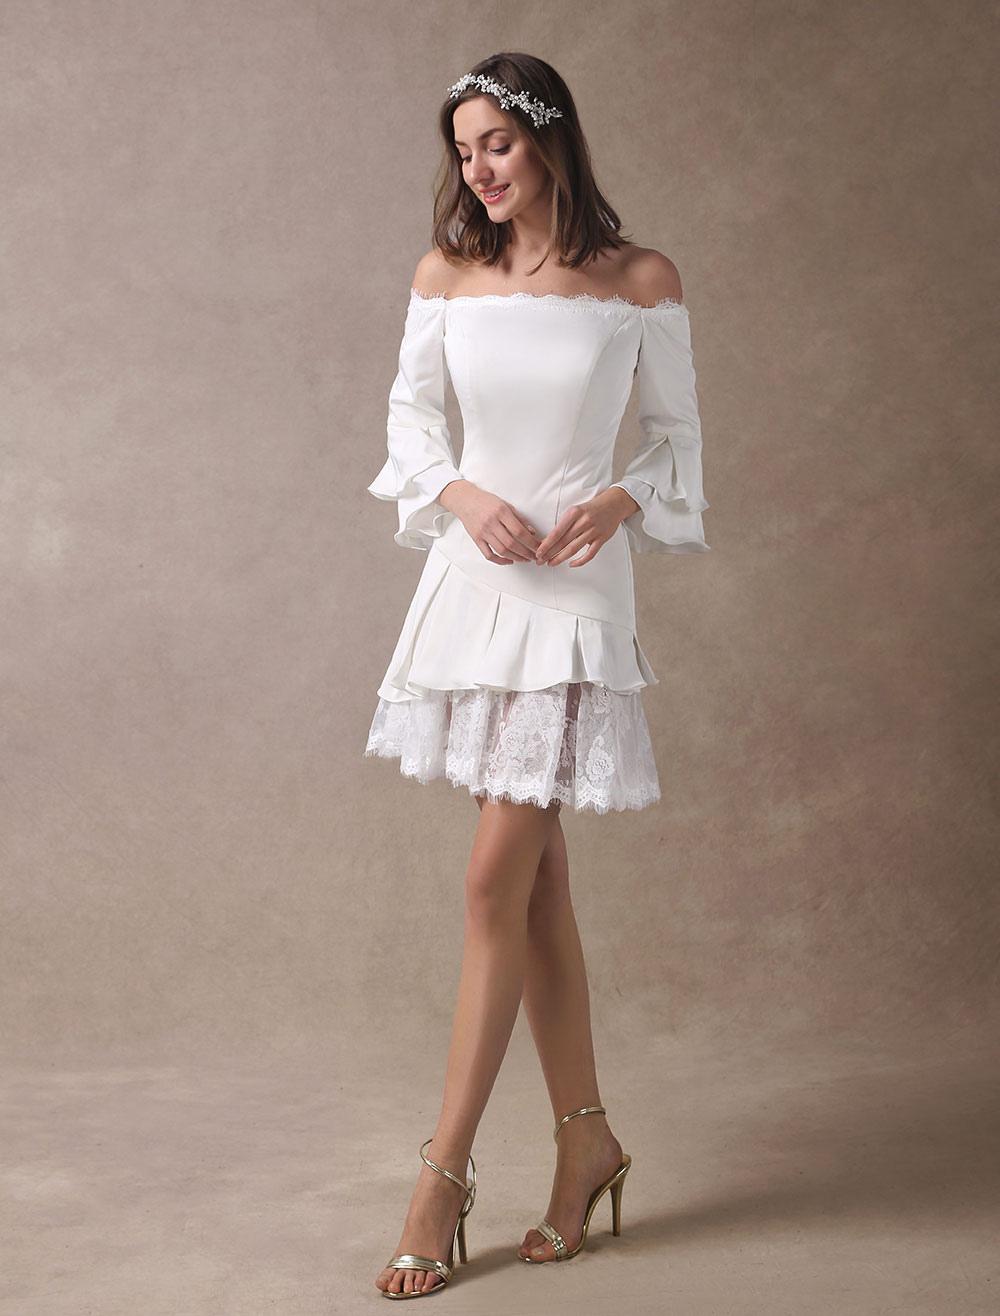 Short Wedding Dresses Boho Off The Shoulder Bridal Dress Mini Long Sleeve Tiered Lace Satin Summer Beach Wedding Dress